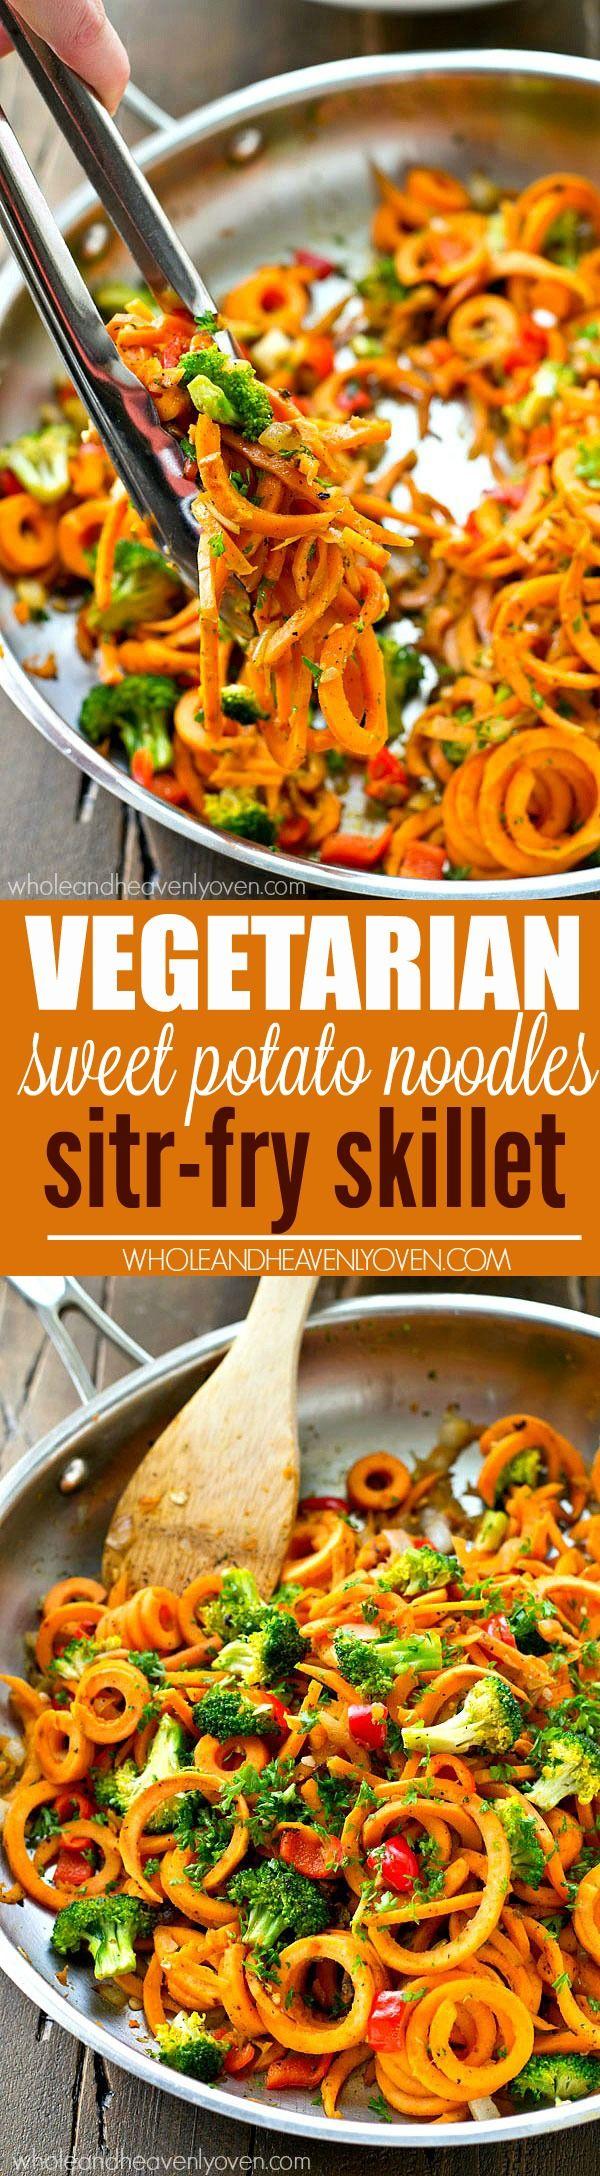 Vegetarian Sweet Potato Noodles Stir-Fry